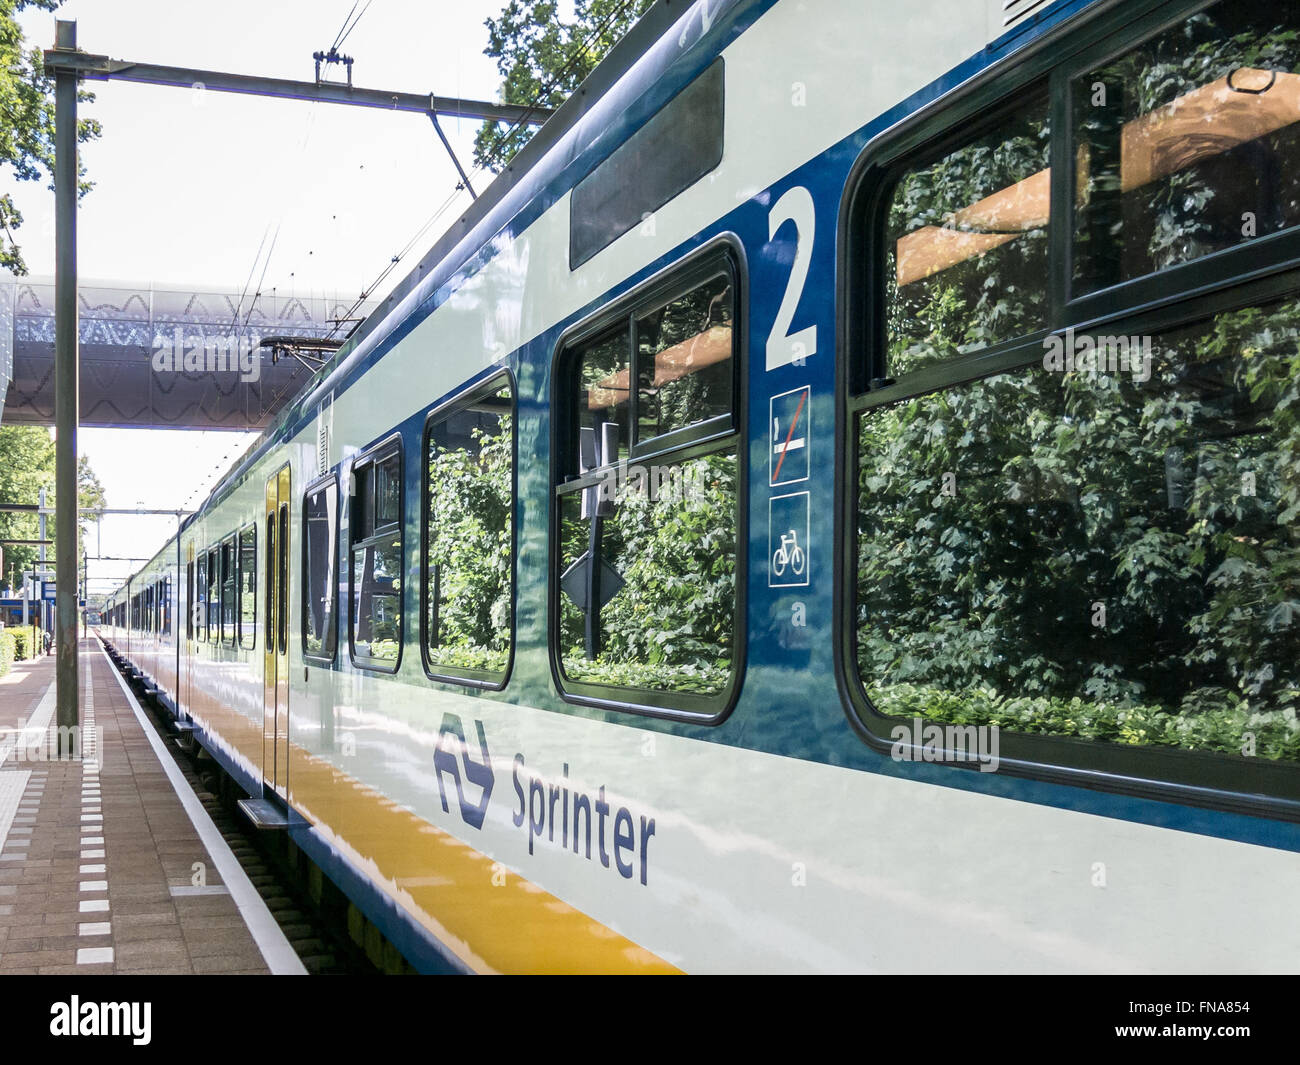 Sprinter train on railway station Mediapark in Hilversum, the Netherlands - Stock Image